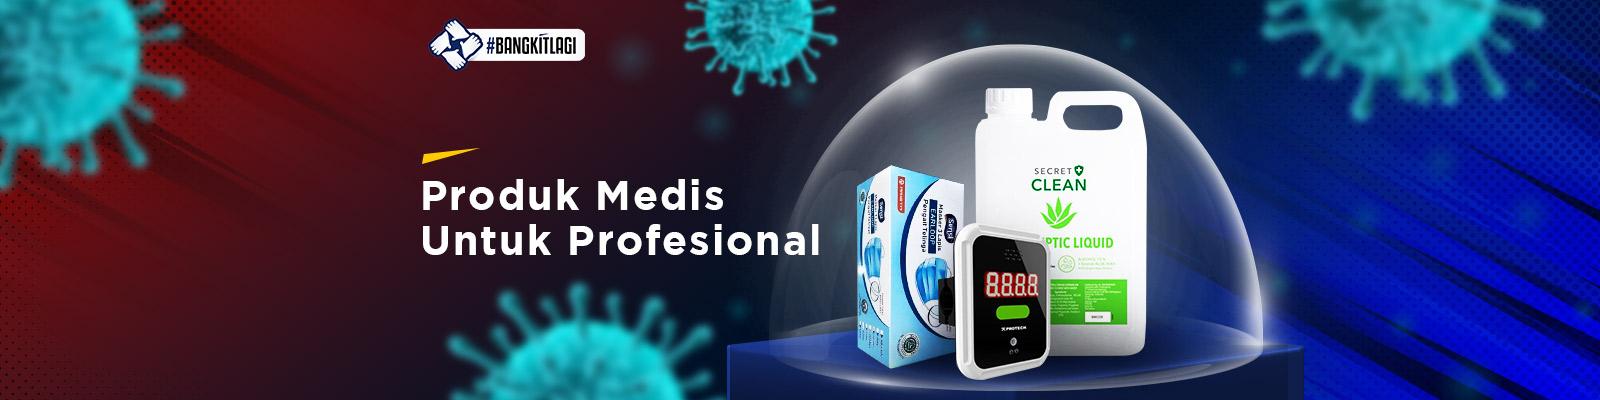 Peralatan Medis Profesional